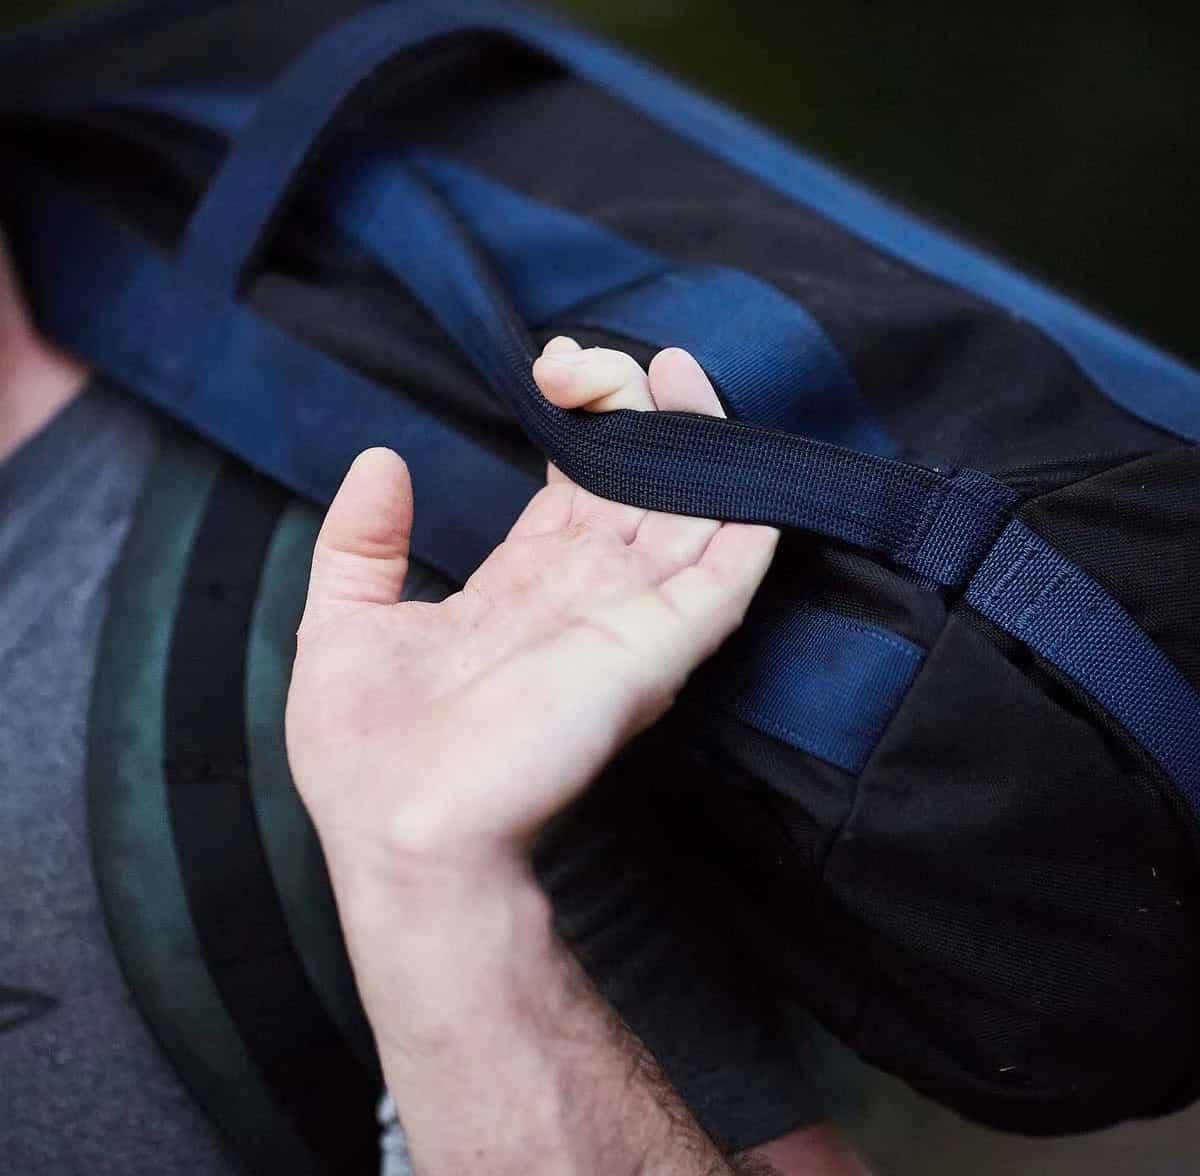 GORUCK Sandbags 60lb black blue carried